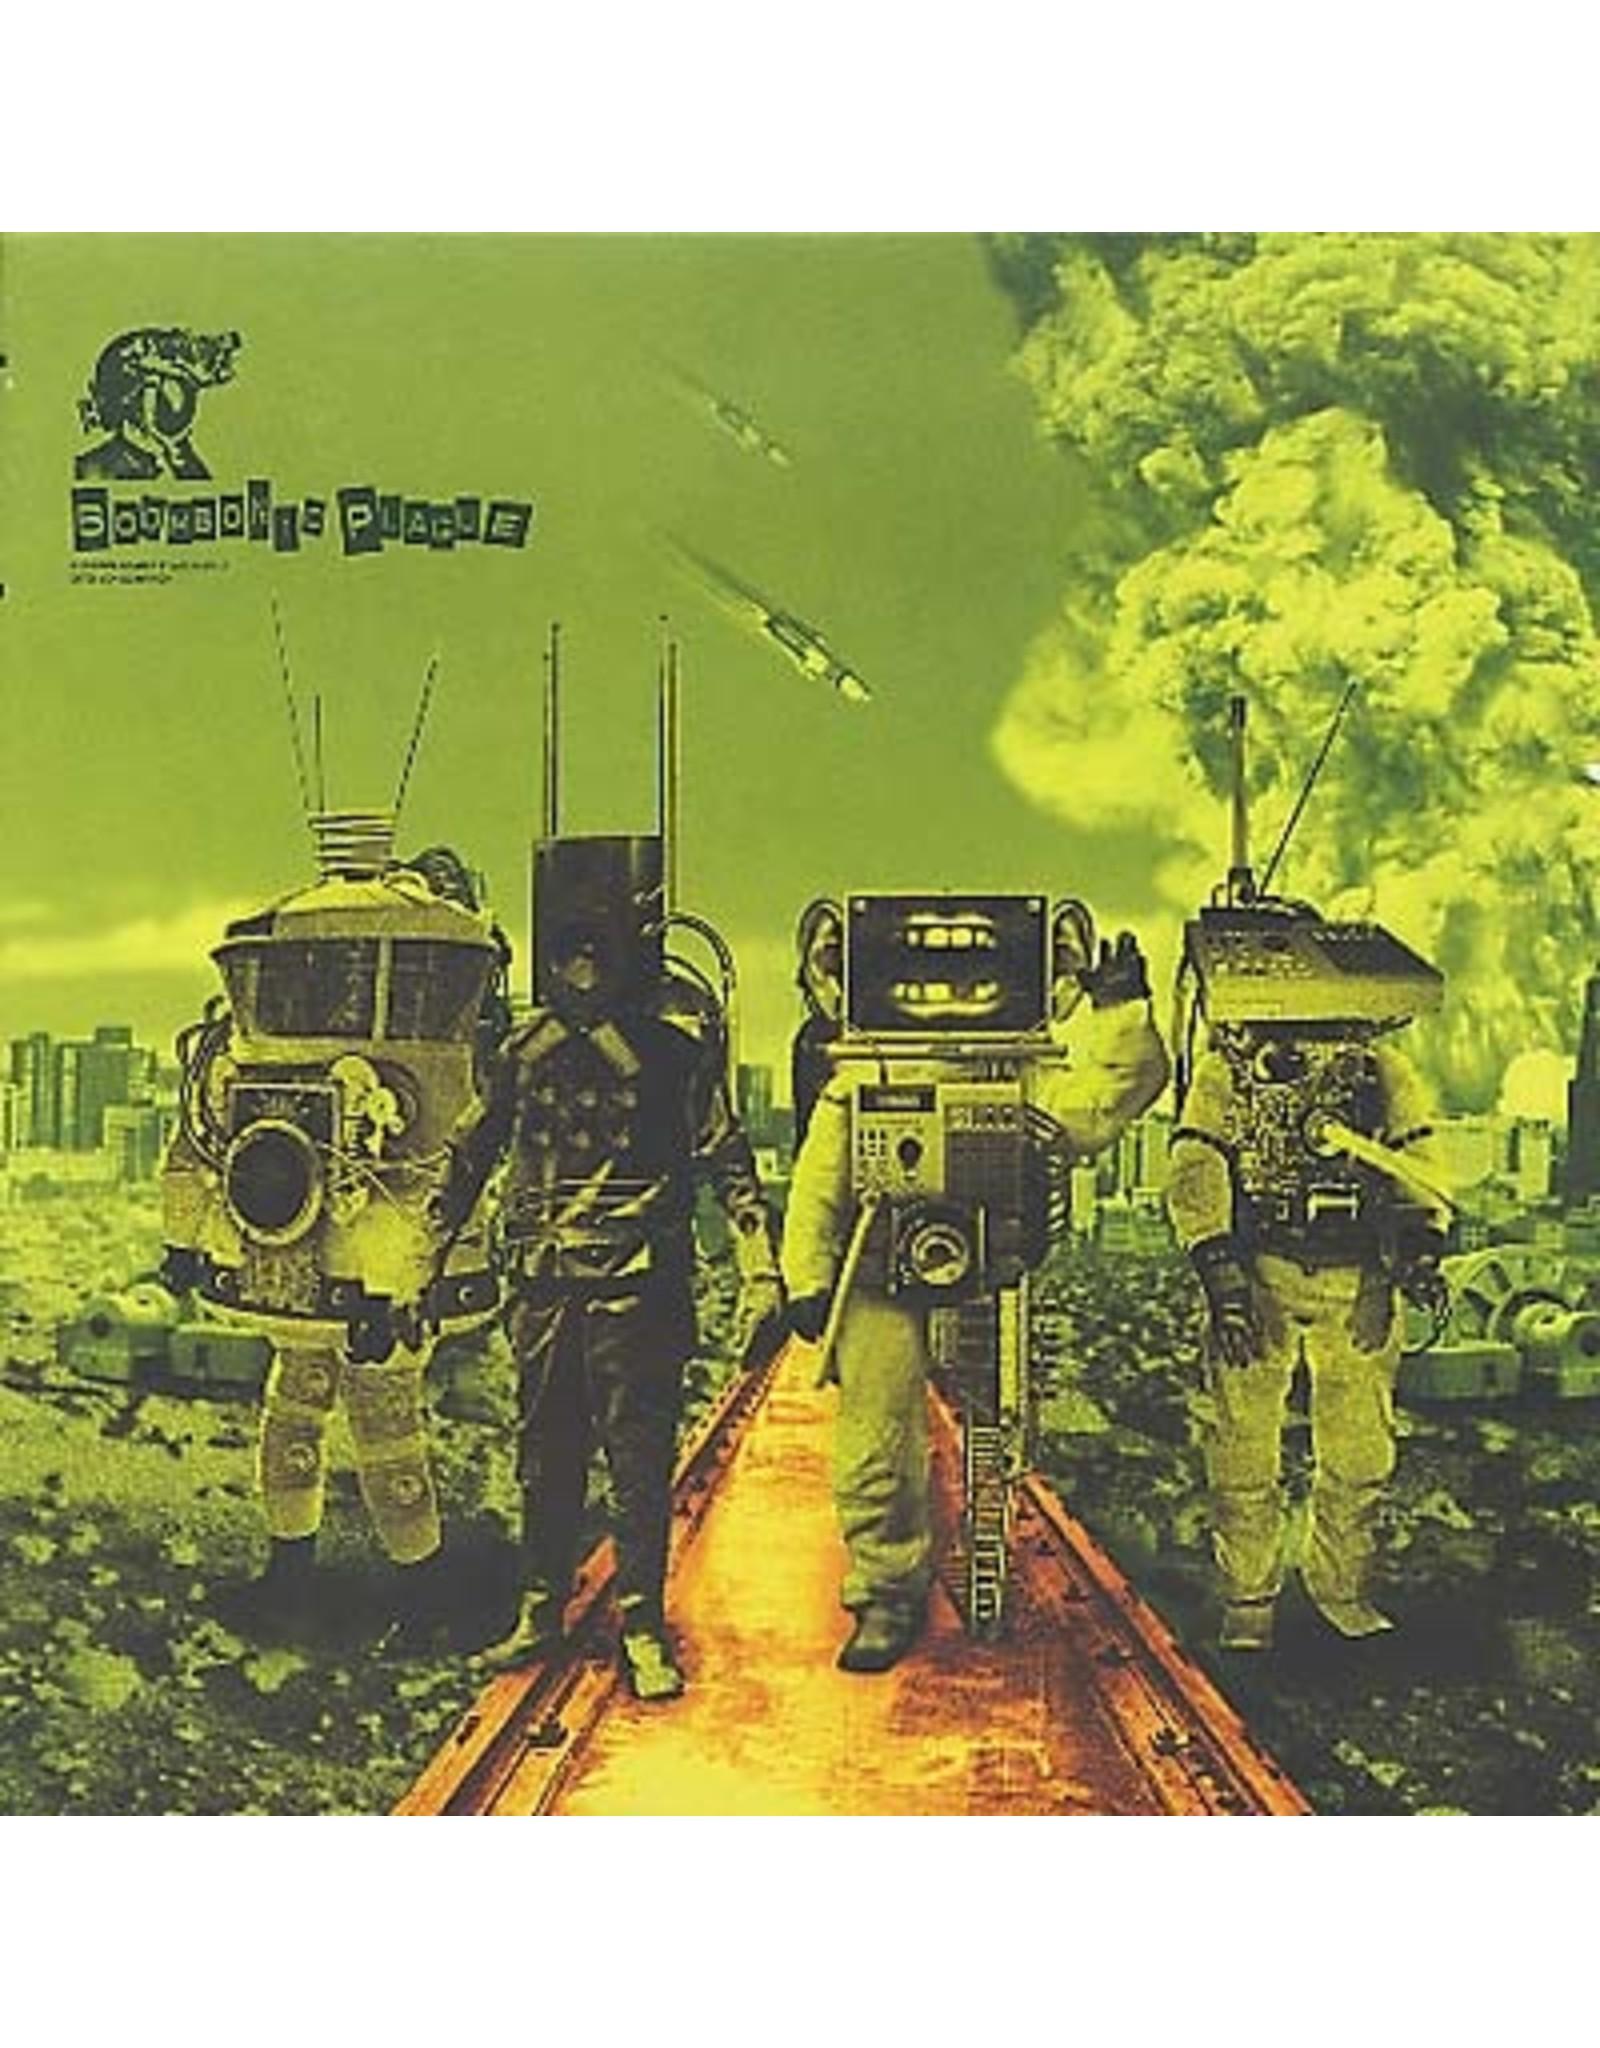 "New Vinyl Otto Von Schirach - Boombonic Plague: Chopped Zombie Fungus Vol. 1 12"""